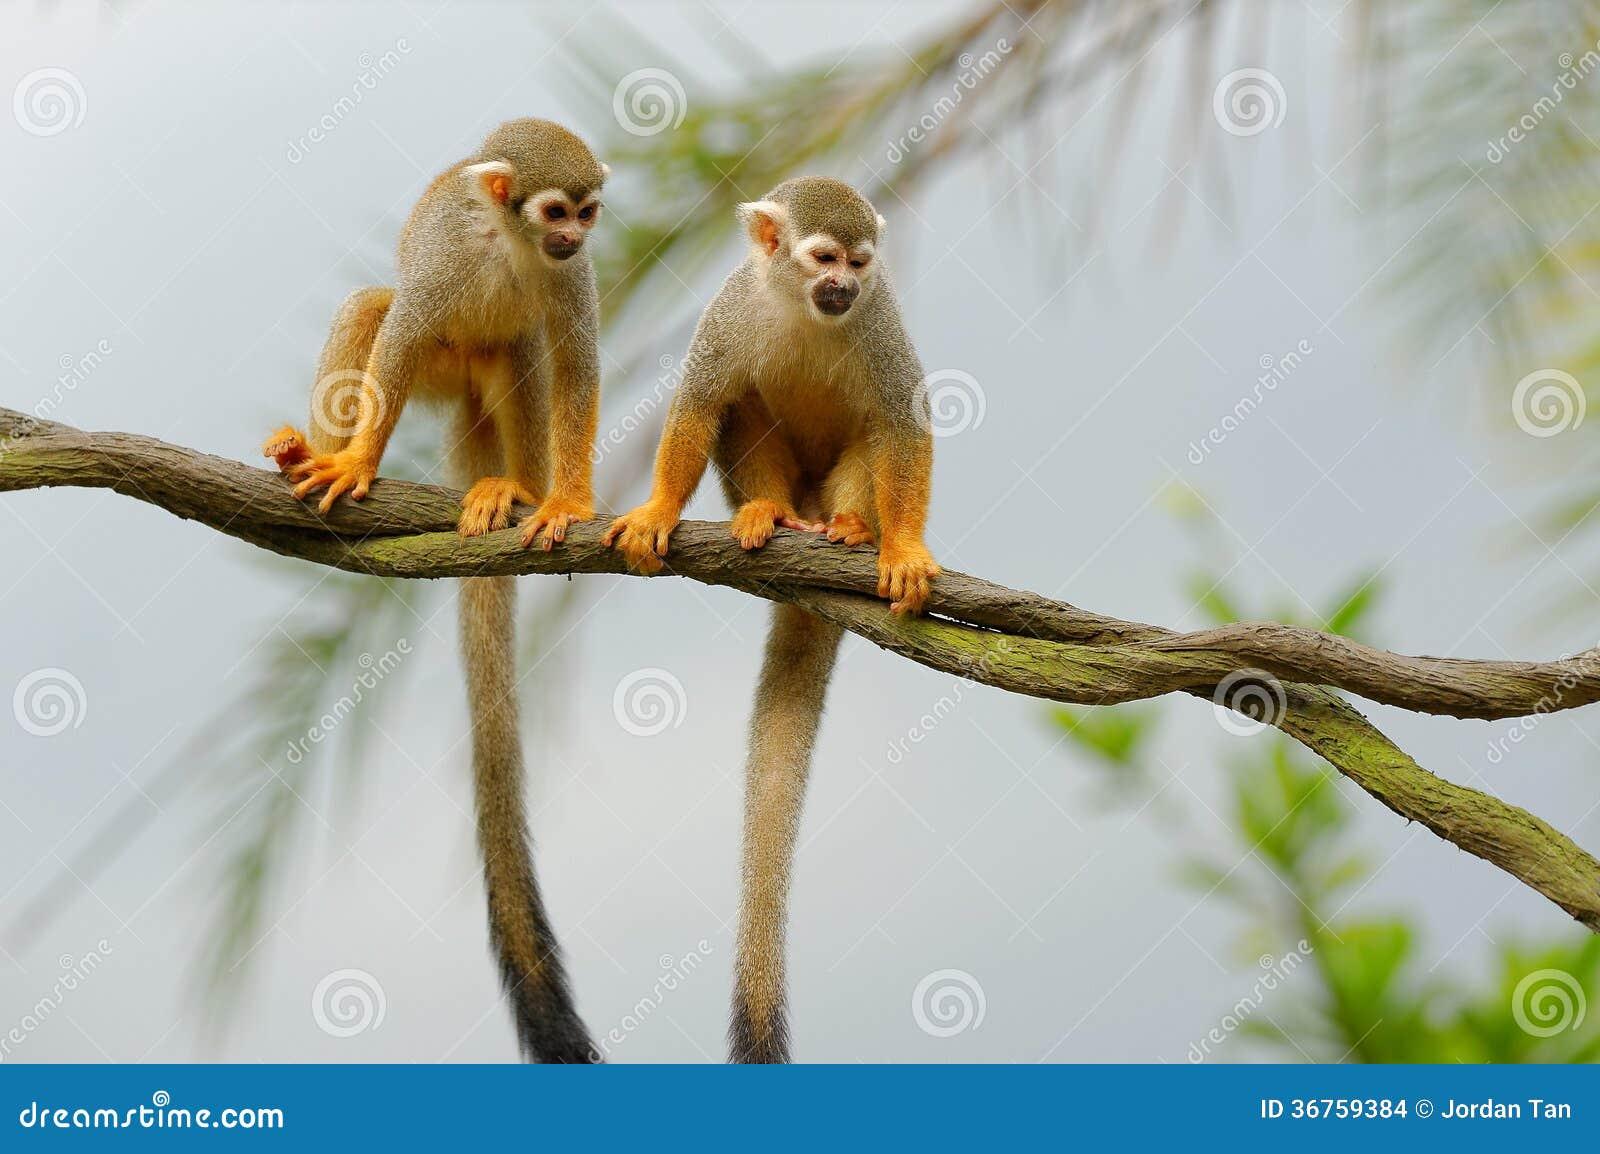 Squirrel monkeys in trees - photo#24